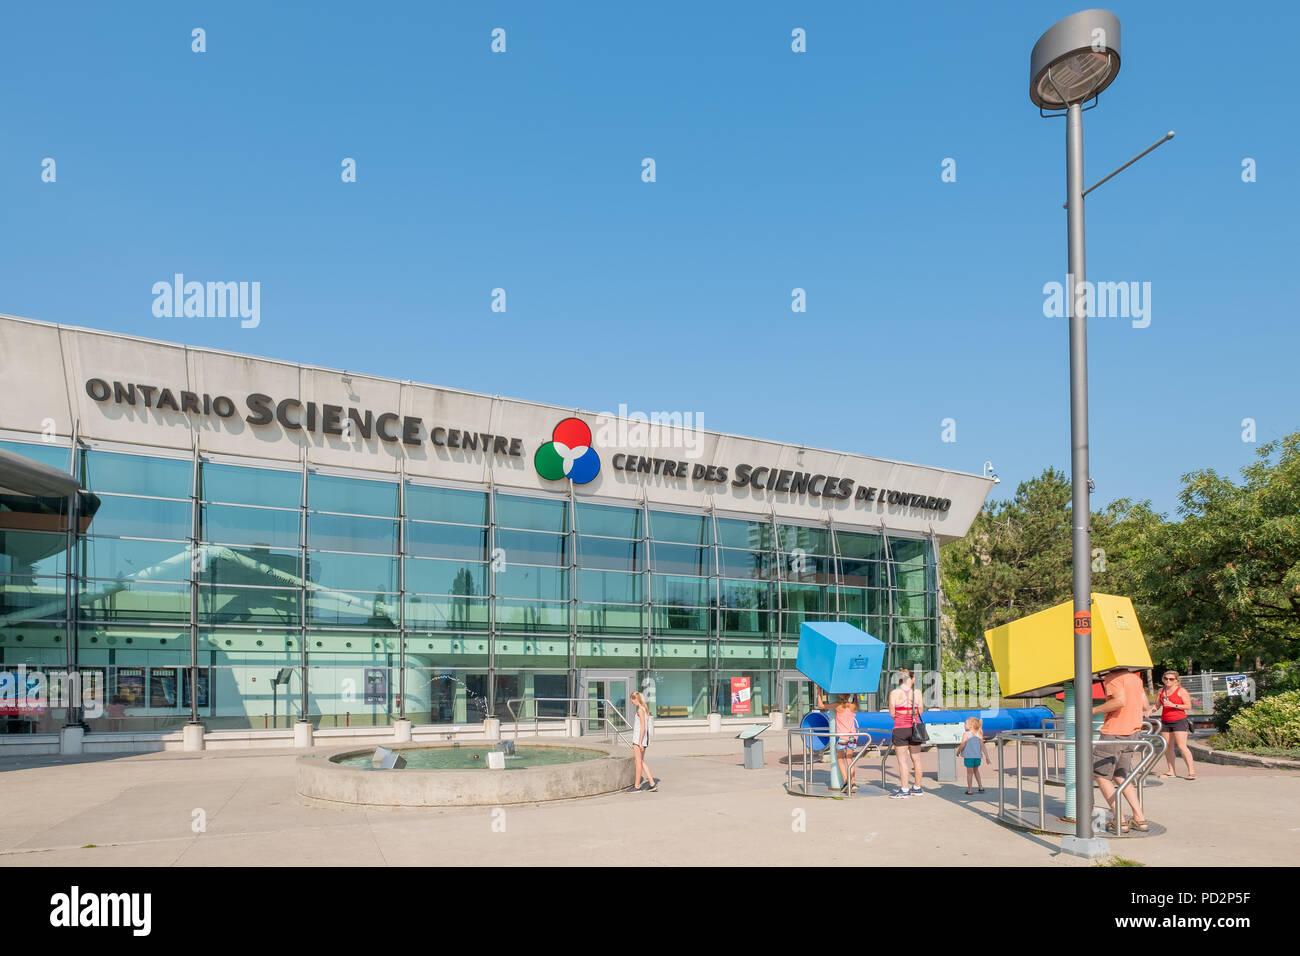 Familien mit dem interaktiven Displays außerhalb des Ontario Science Centre in Toronto, Ontario, Kanada. Stockbild